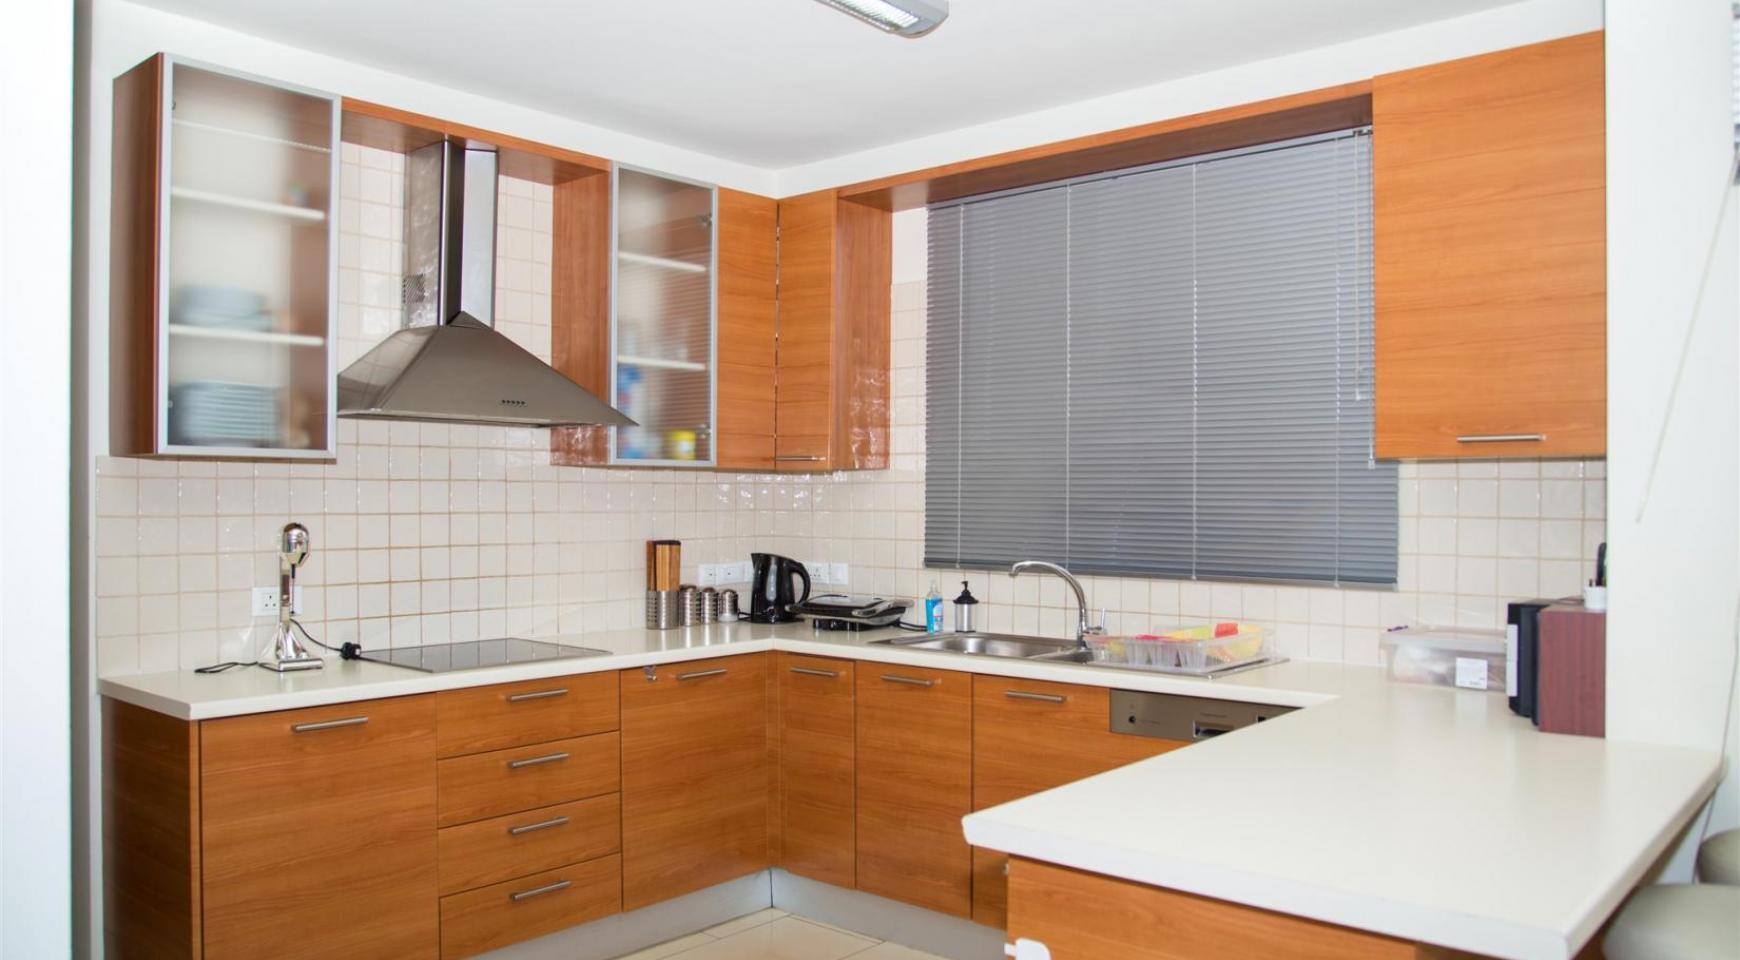 Modern Luxury 4 Bedroom Villa in Sfalagiotisa, Agios Athanasios - 24